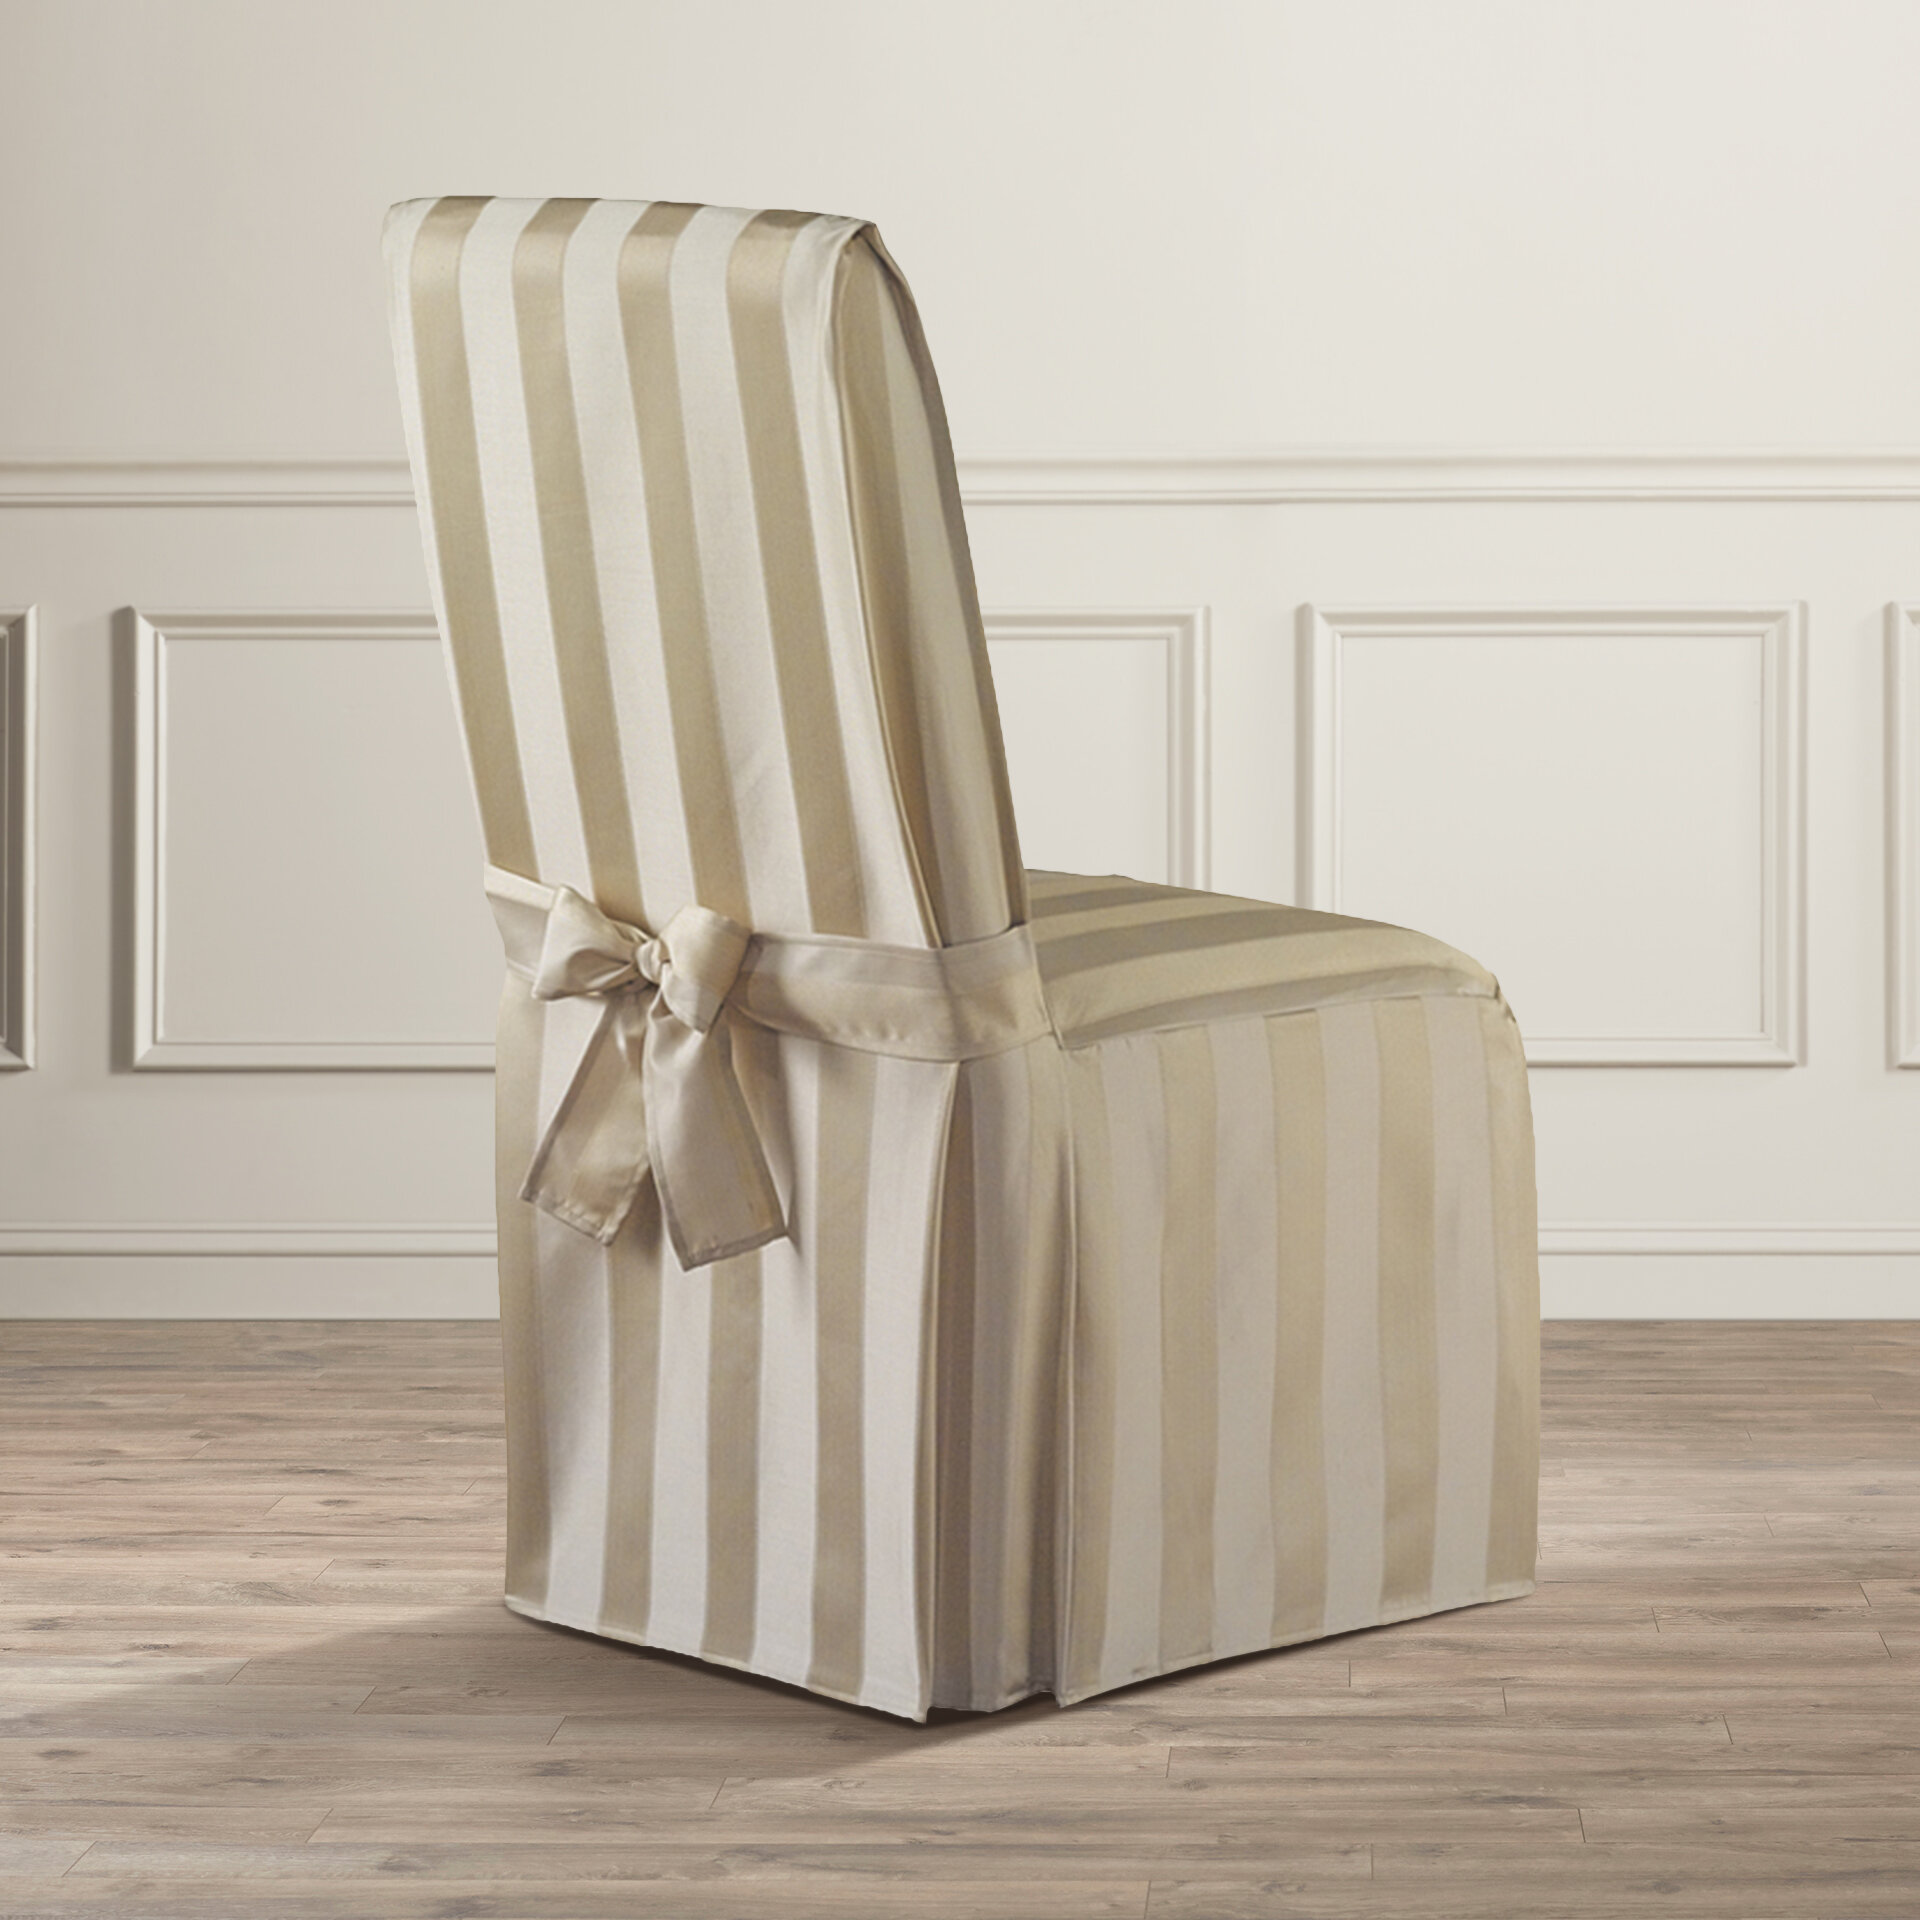 Astoria Grand Polyester Parson Chair Slipcover eBay